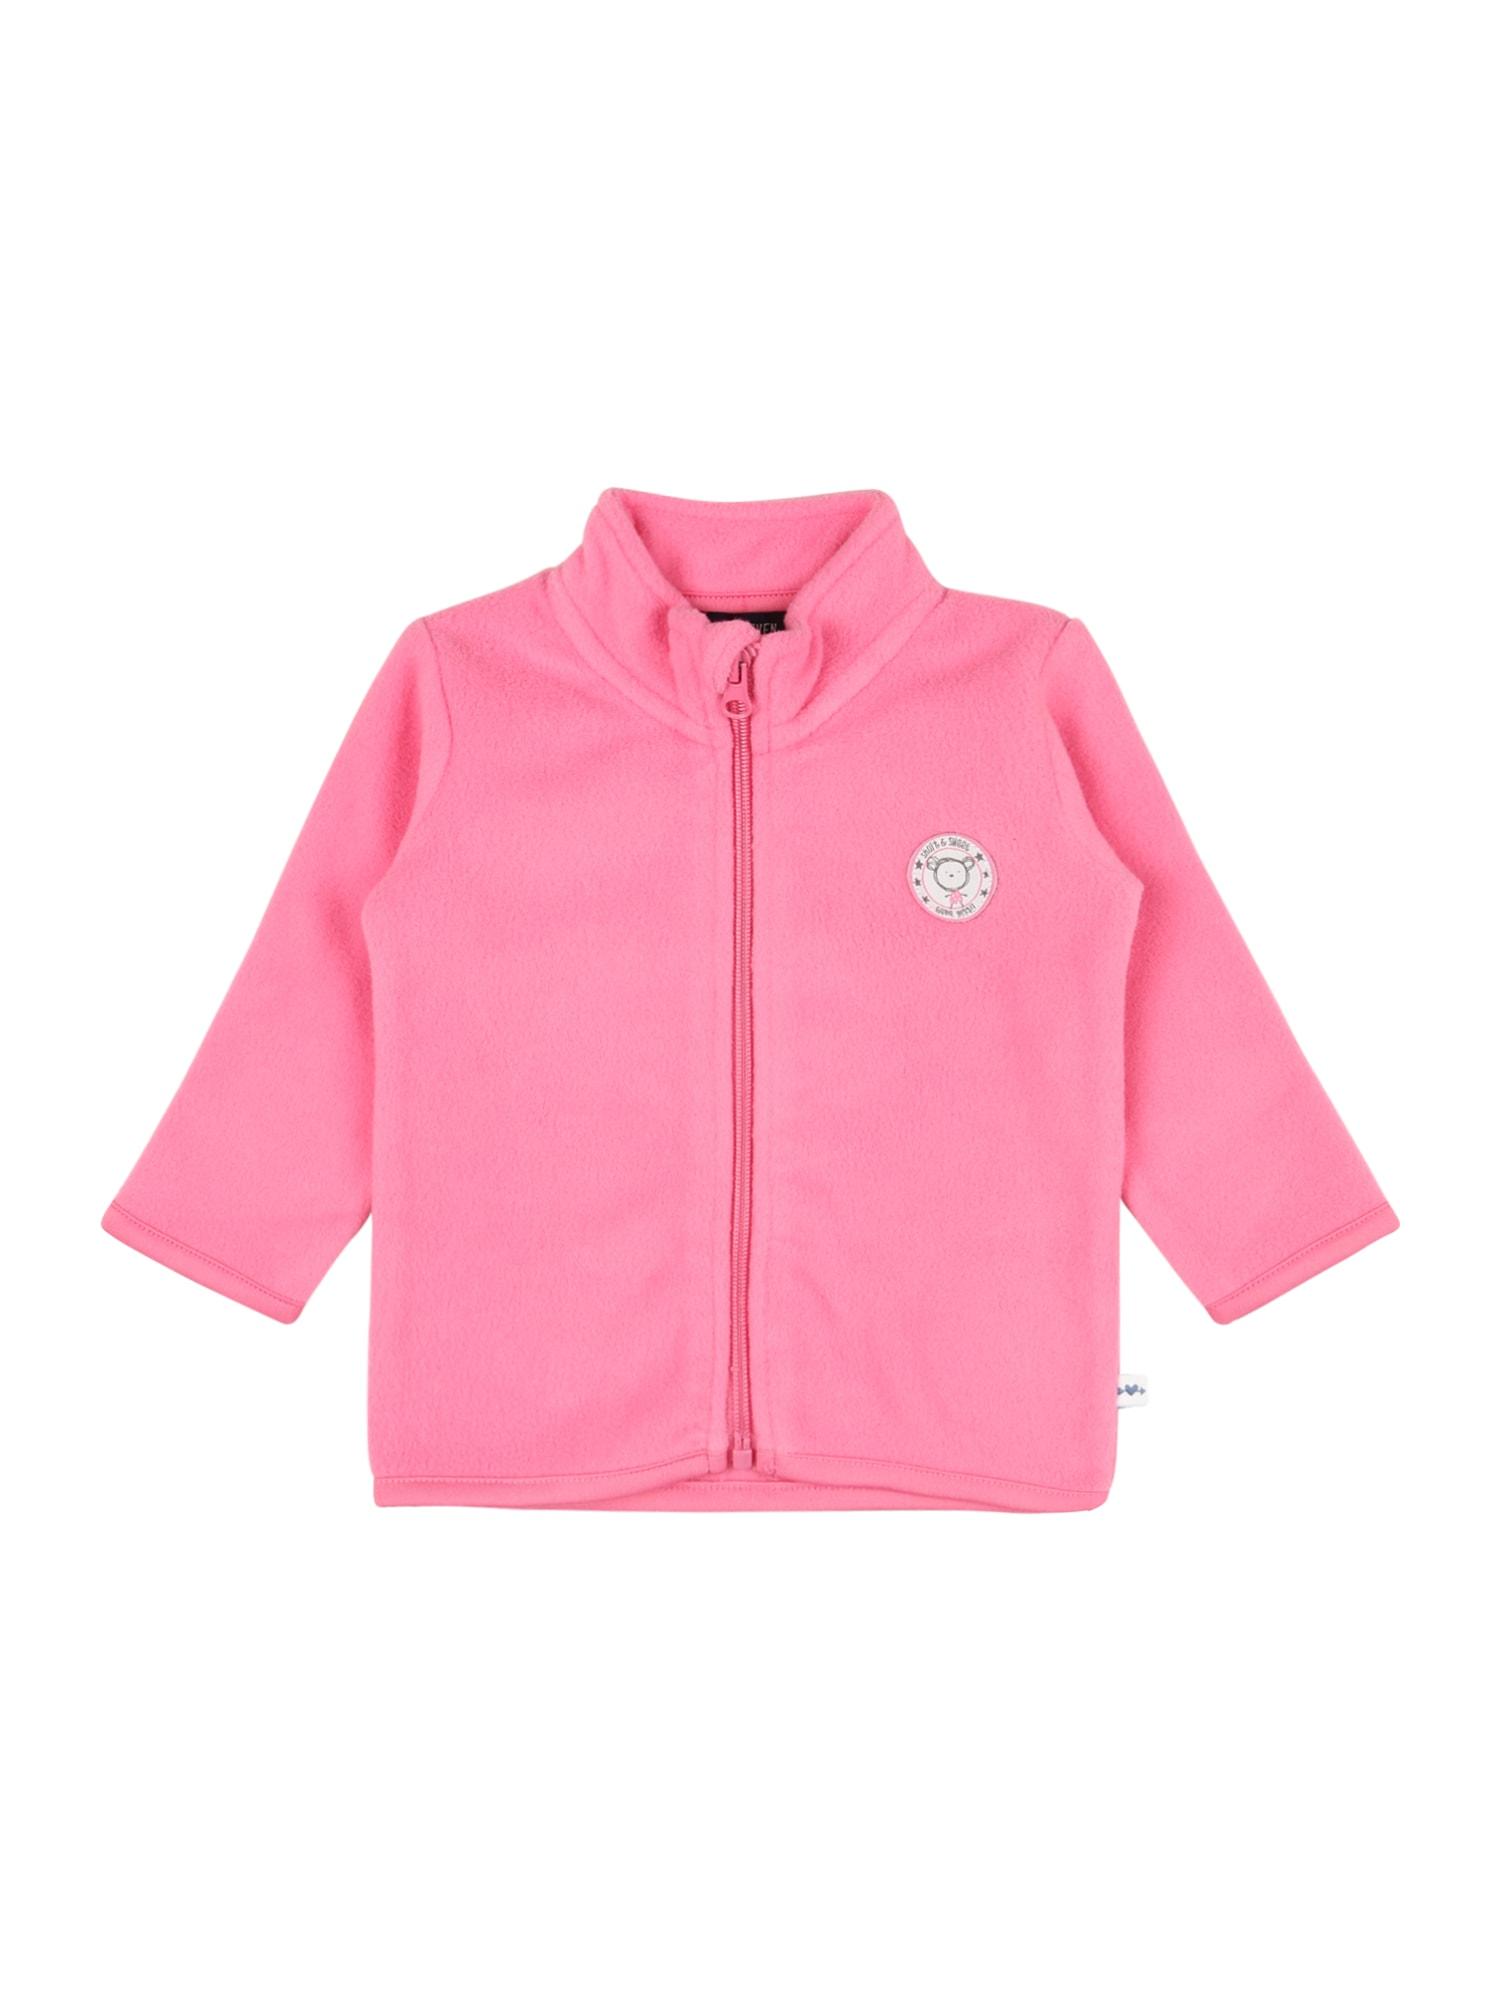 BLUE SEVEN Flisinis džemperis rožinė